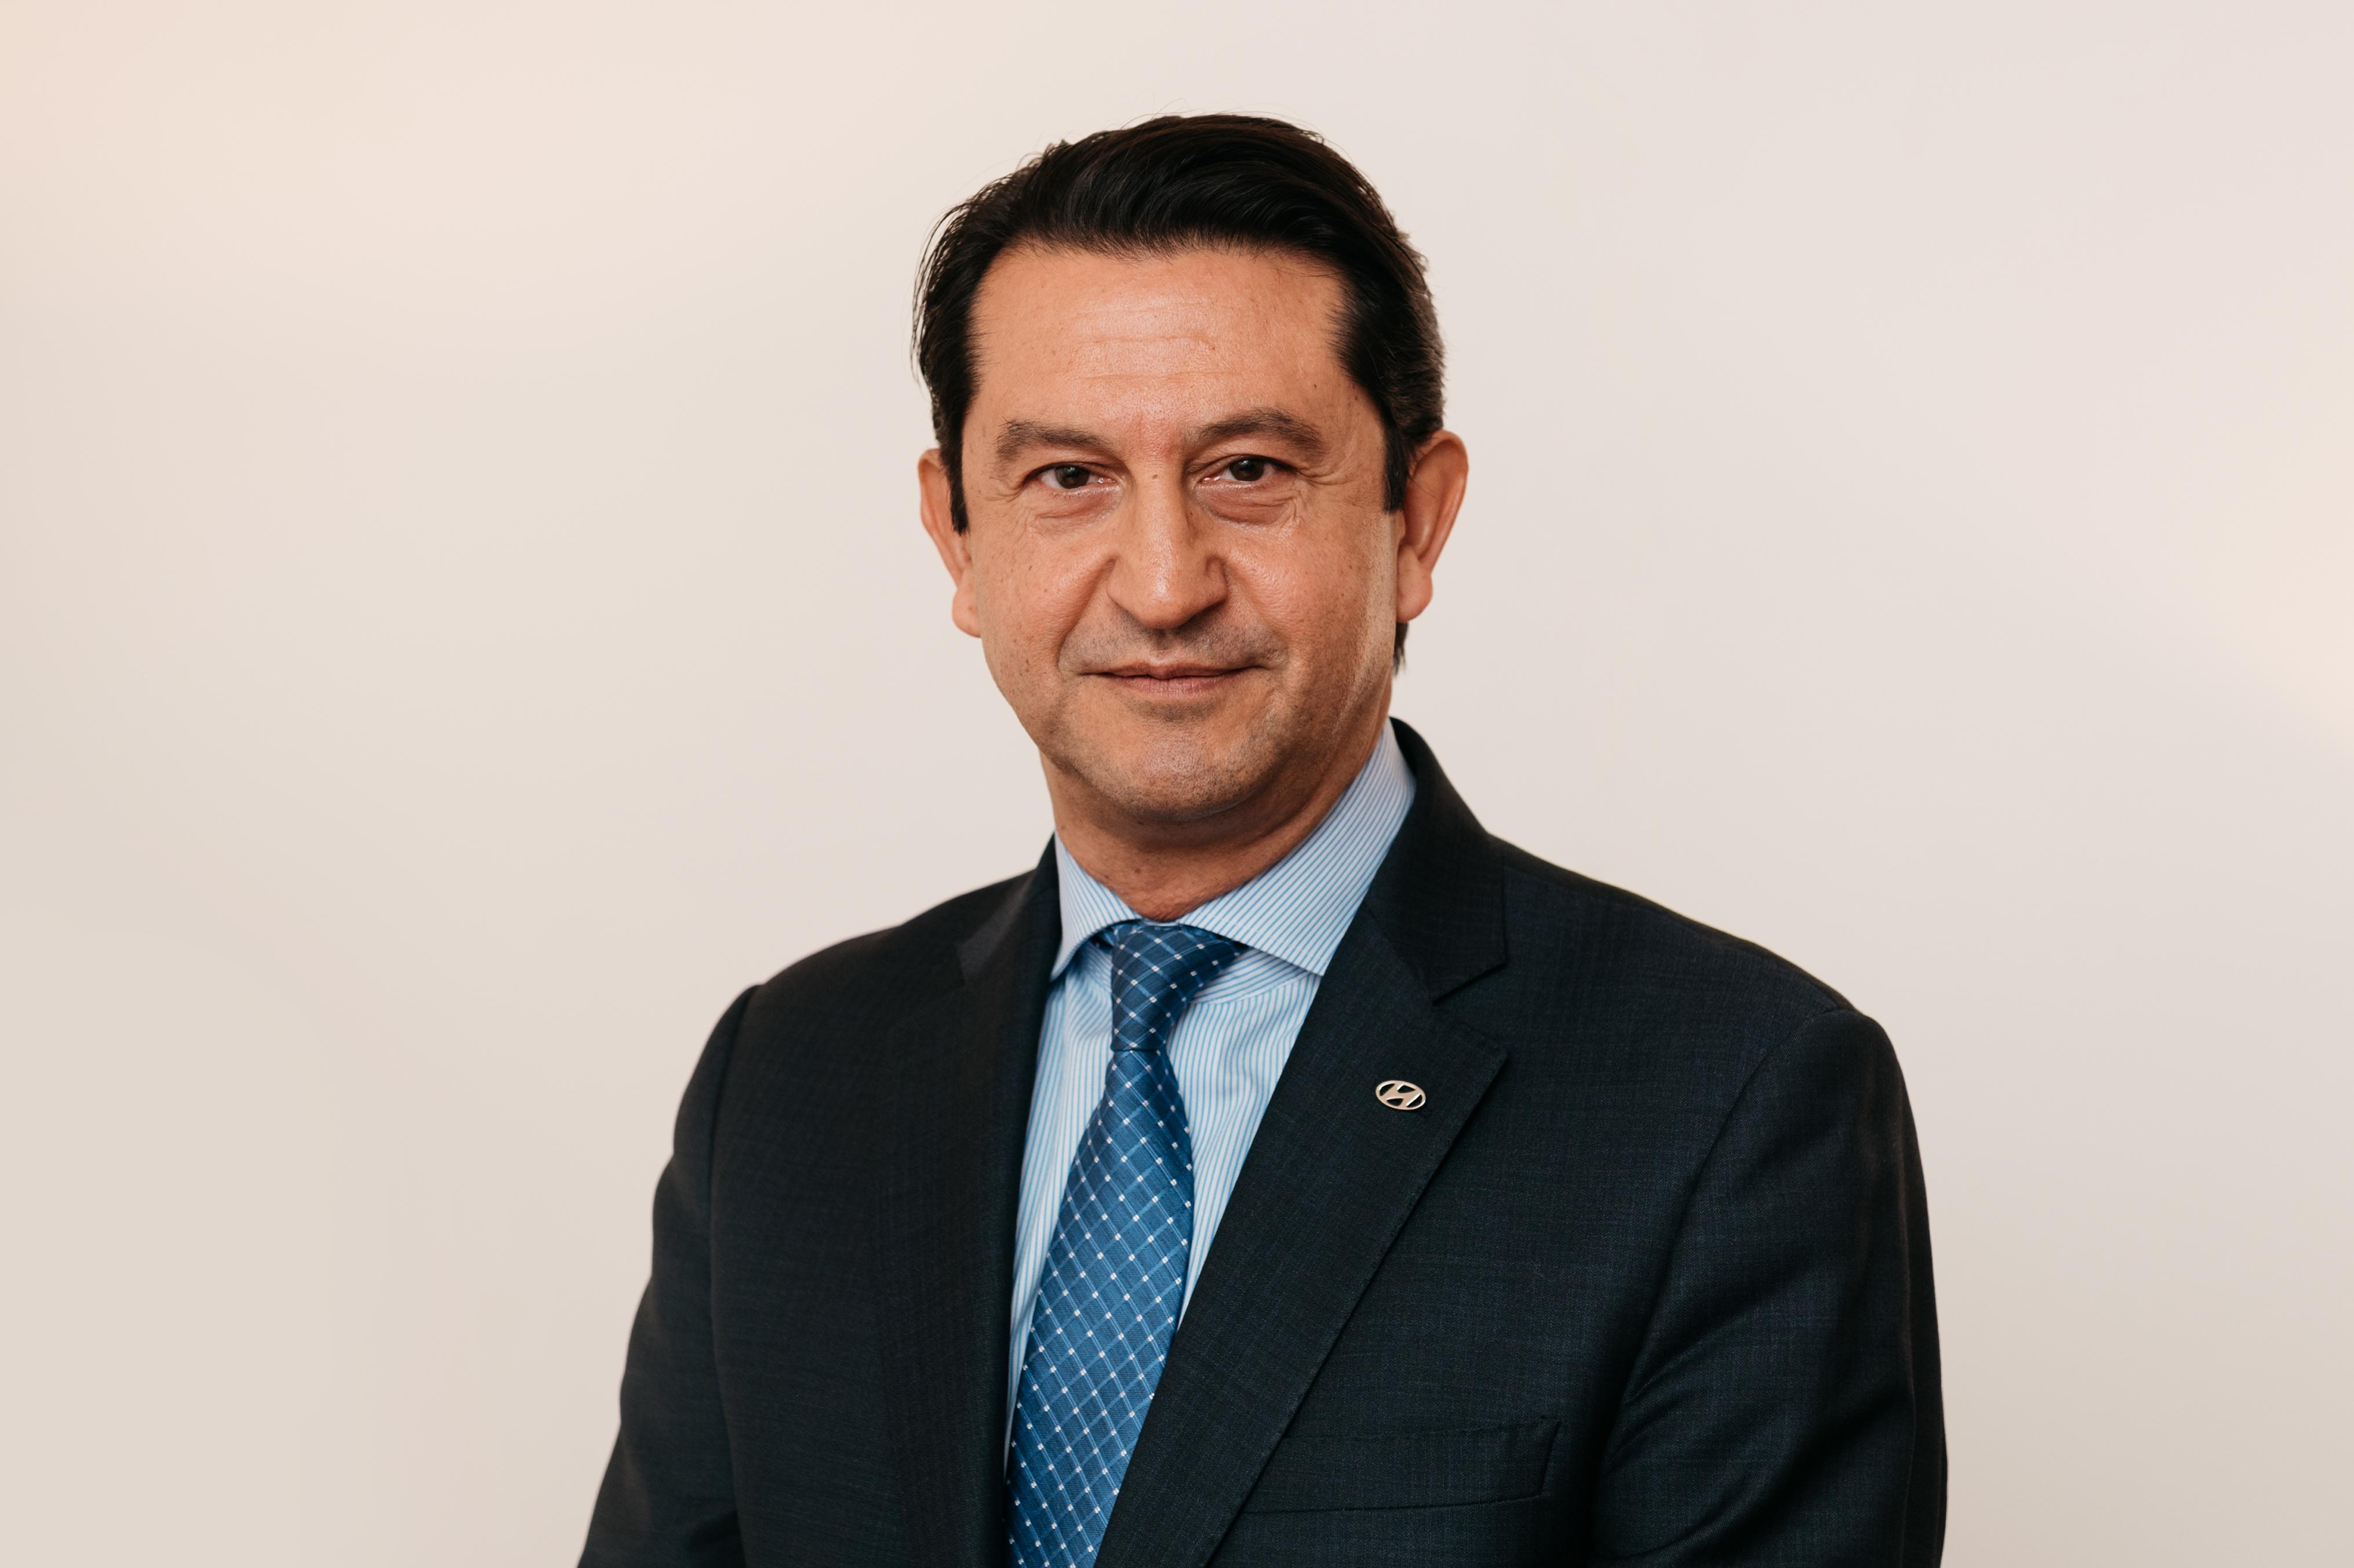 Hyundai Motor Appoints José Muñoz as COO